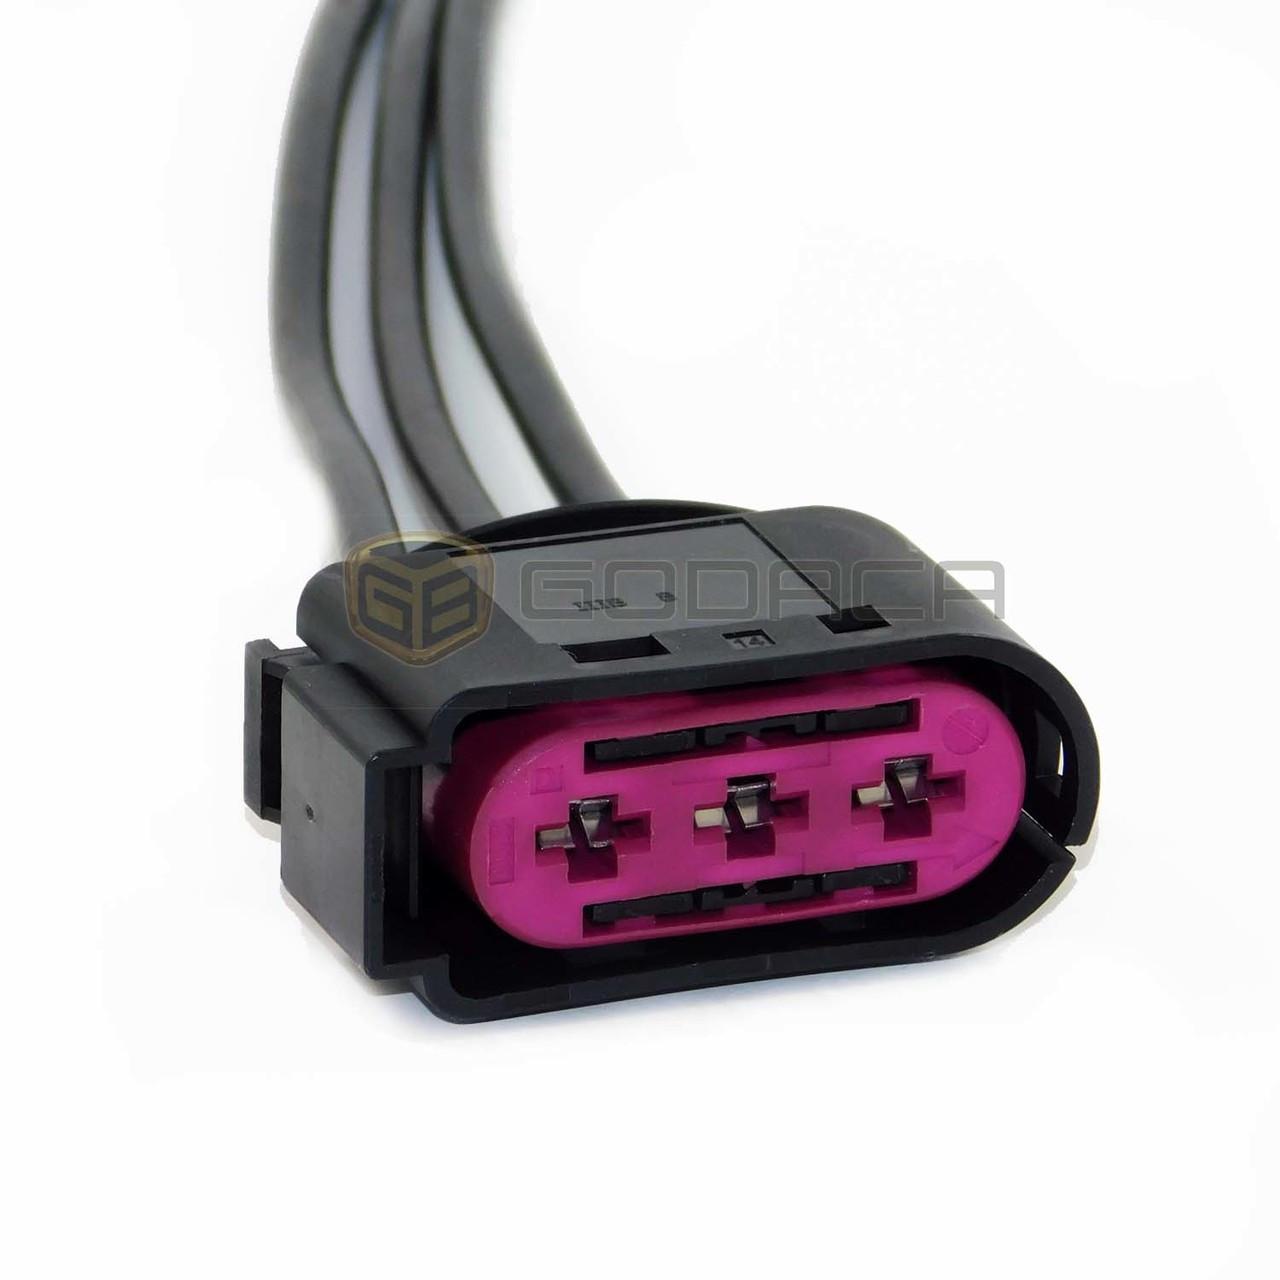 fuse box connector 3 pin plug for vw beetle bora jetta golf mk4 audifuse box connector [ 1280 x 1280 Pixel ]